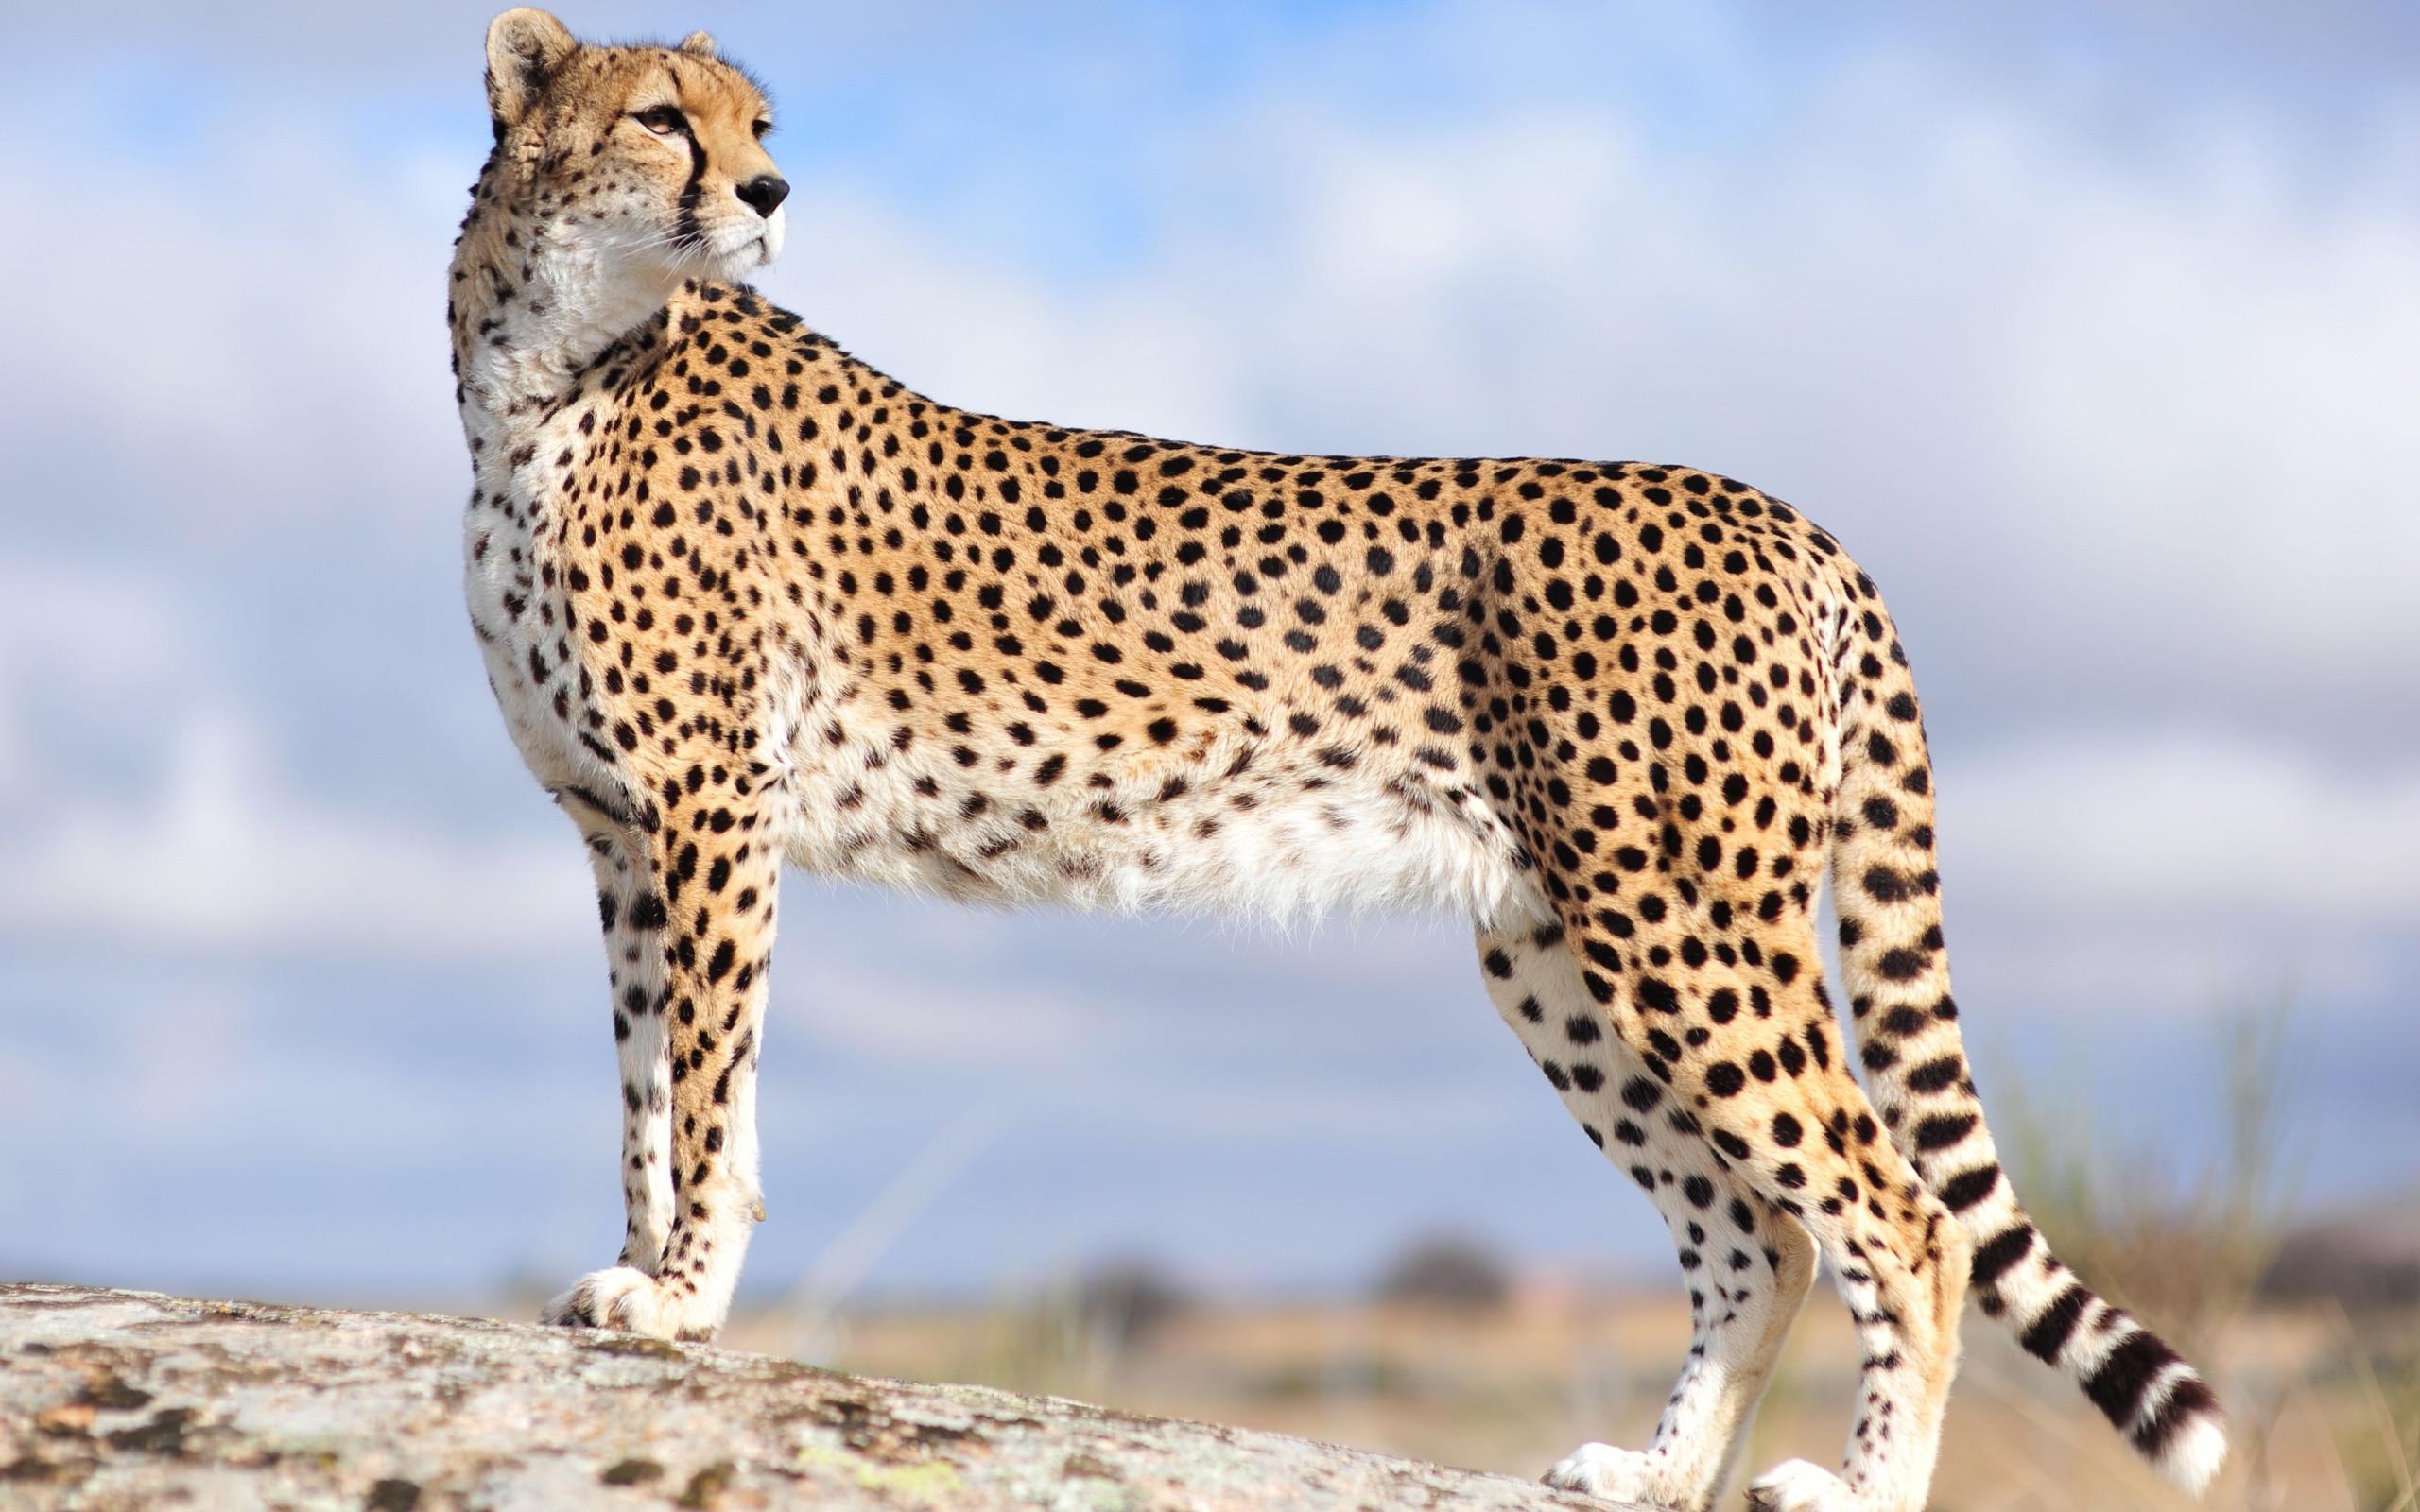 Res: 2560x1600, Cheetah Wallpapers 24 - 2560 X 1600